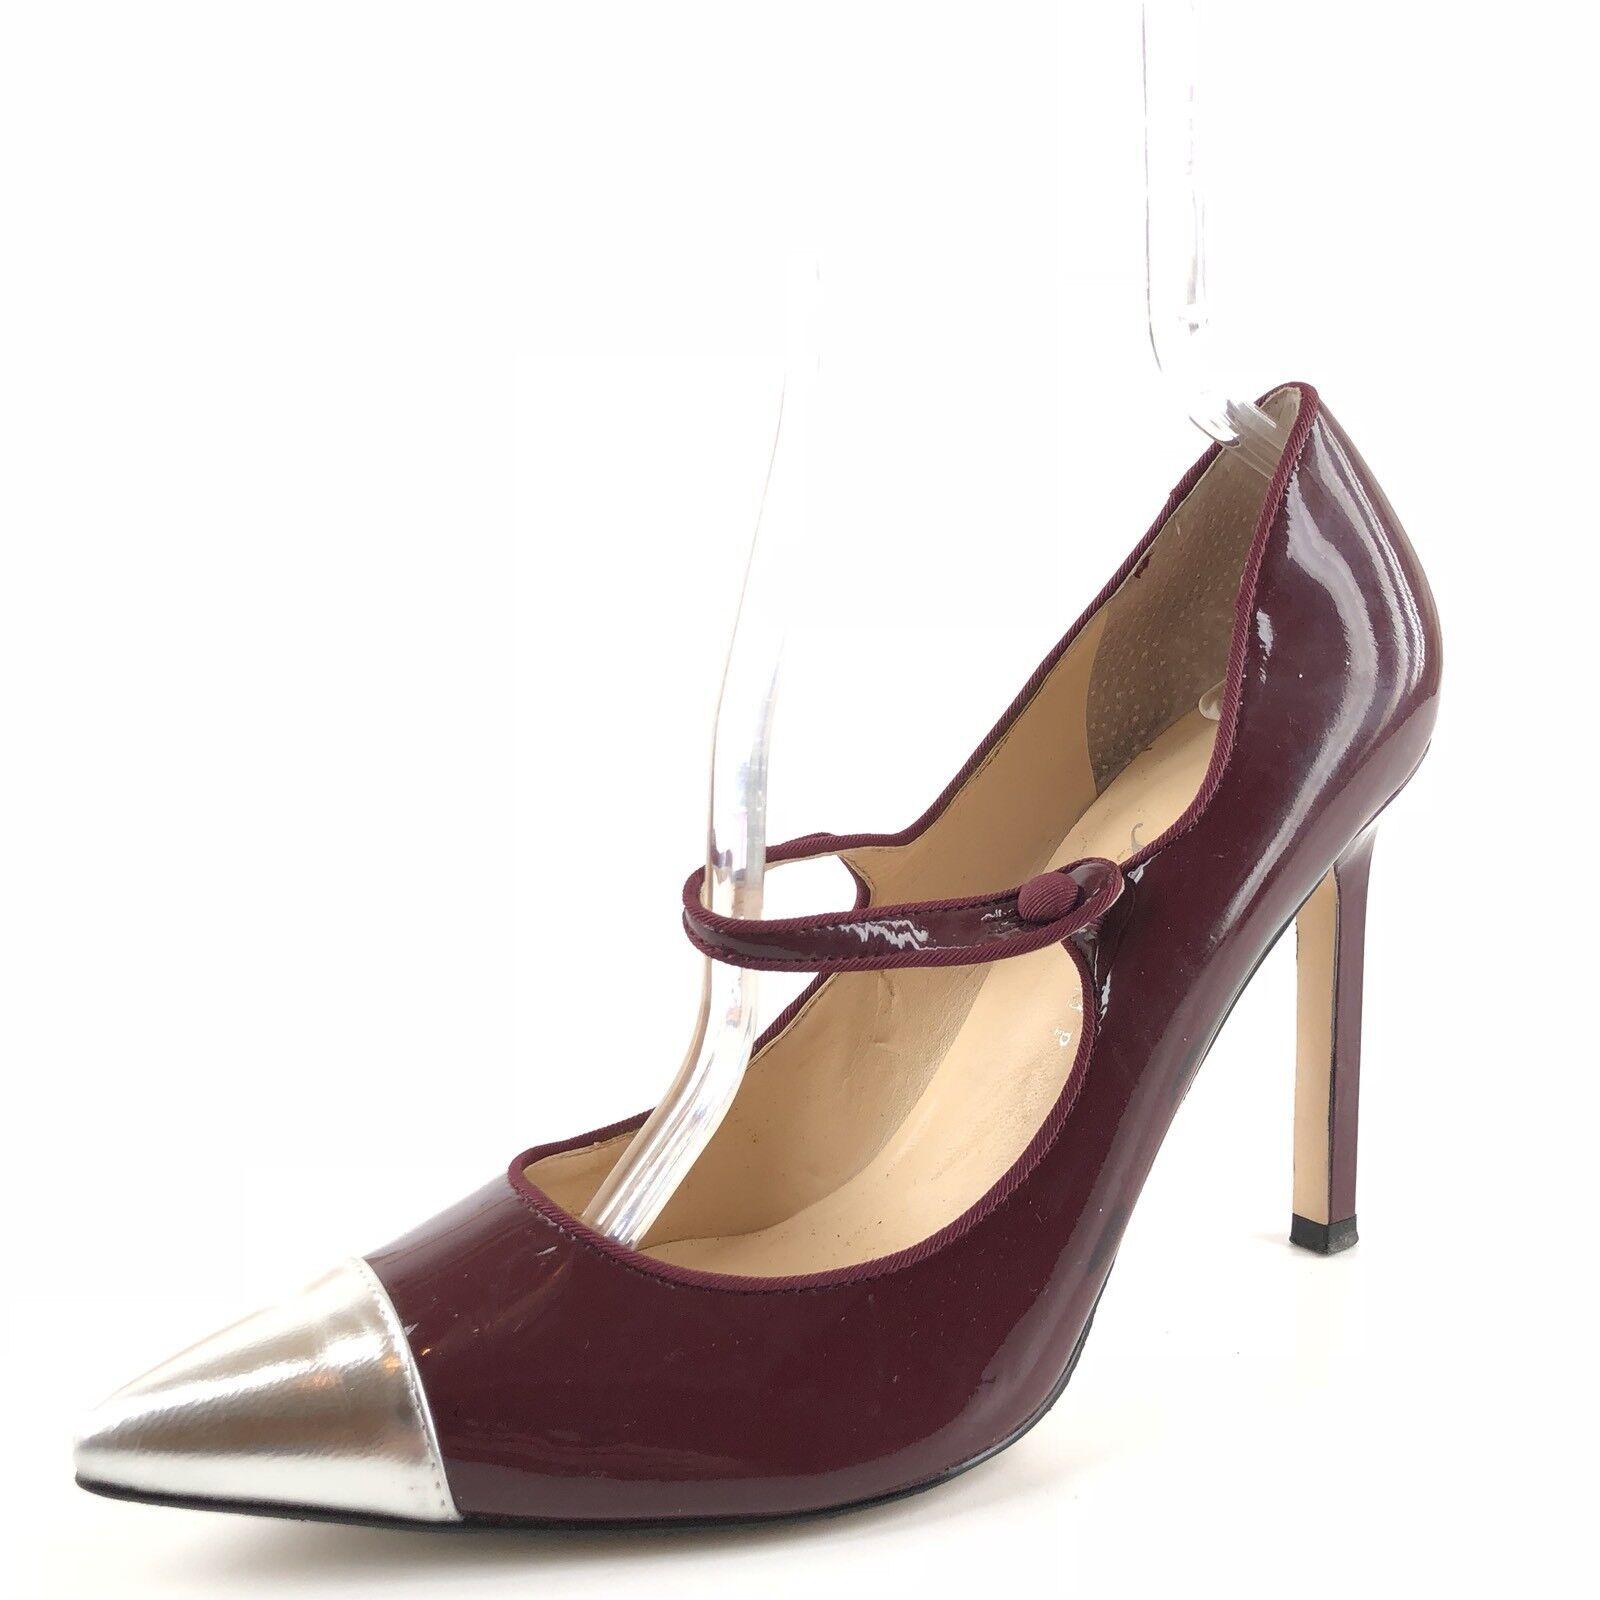 Ivanka Trump Carni Burgundy Leather Cap Toe Pumps Womens Size 9.5 M